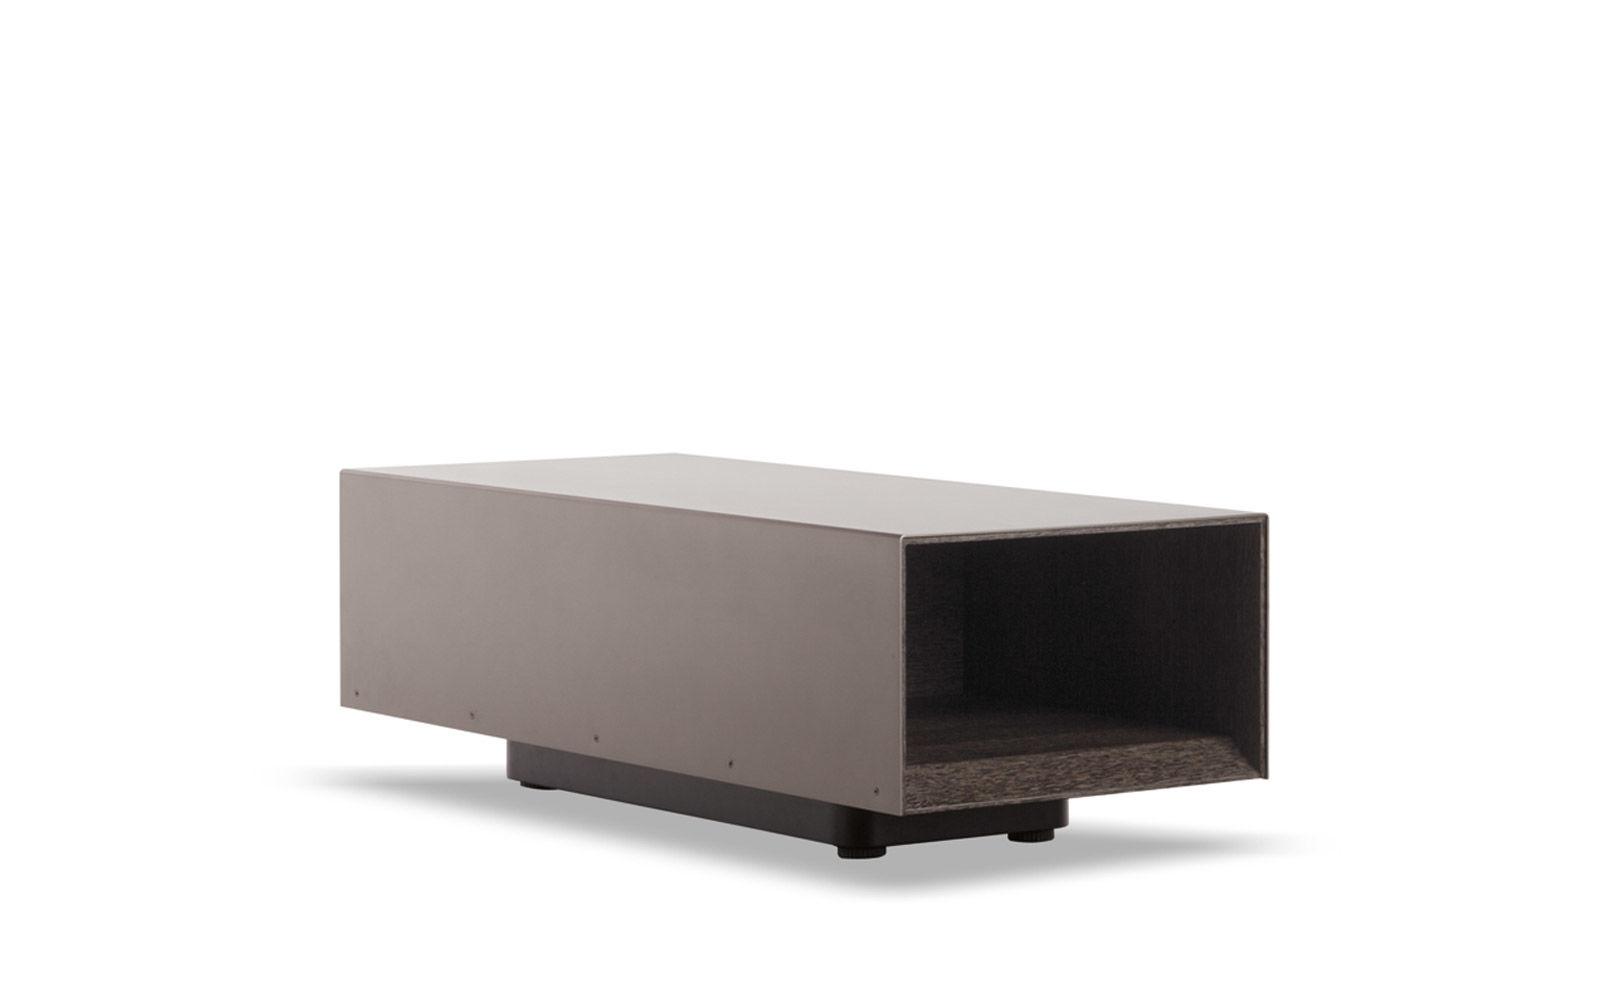 gray coffee tables en. Black Bedroom Furniture Sets. Home Design Ideas